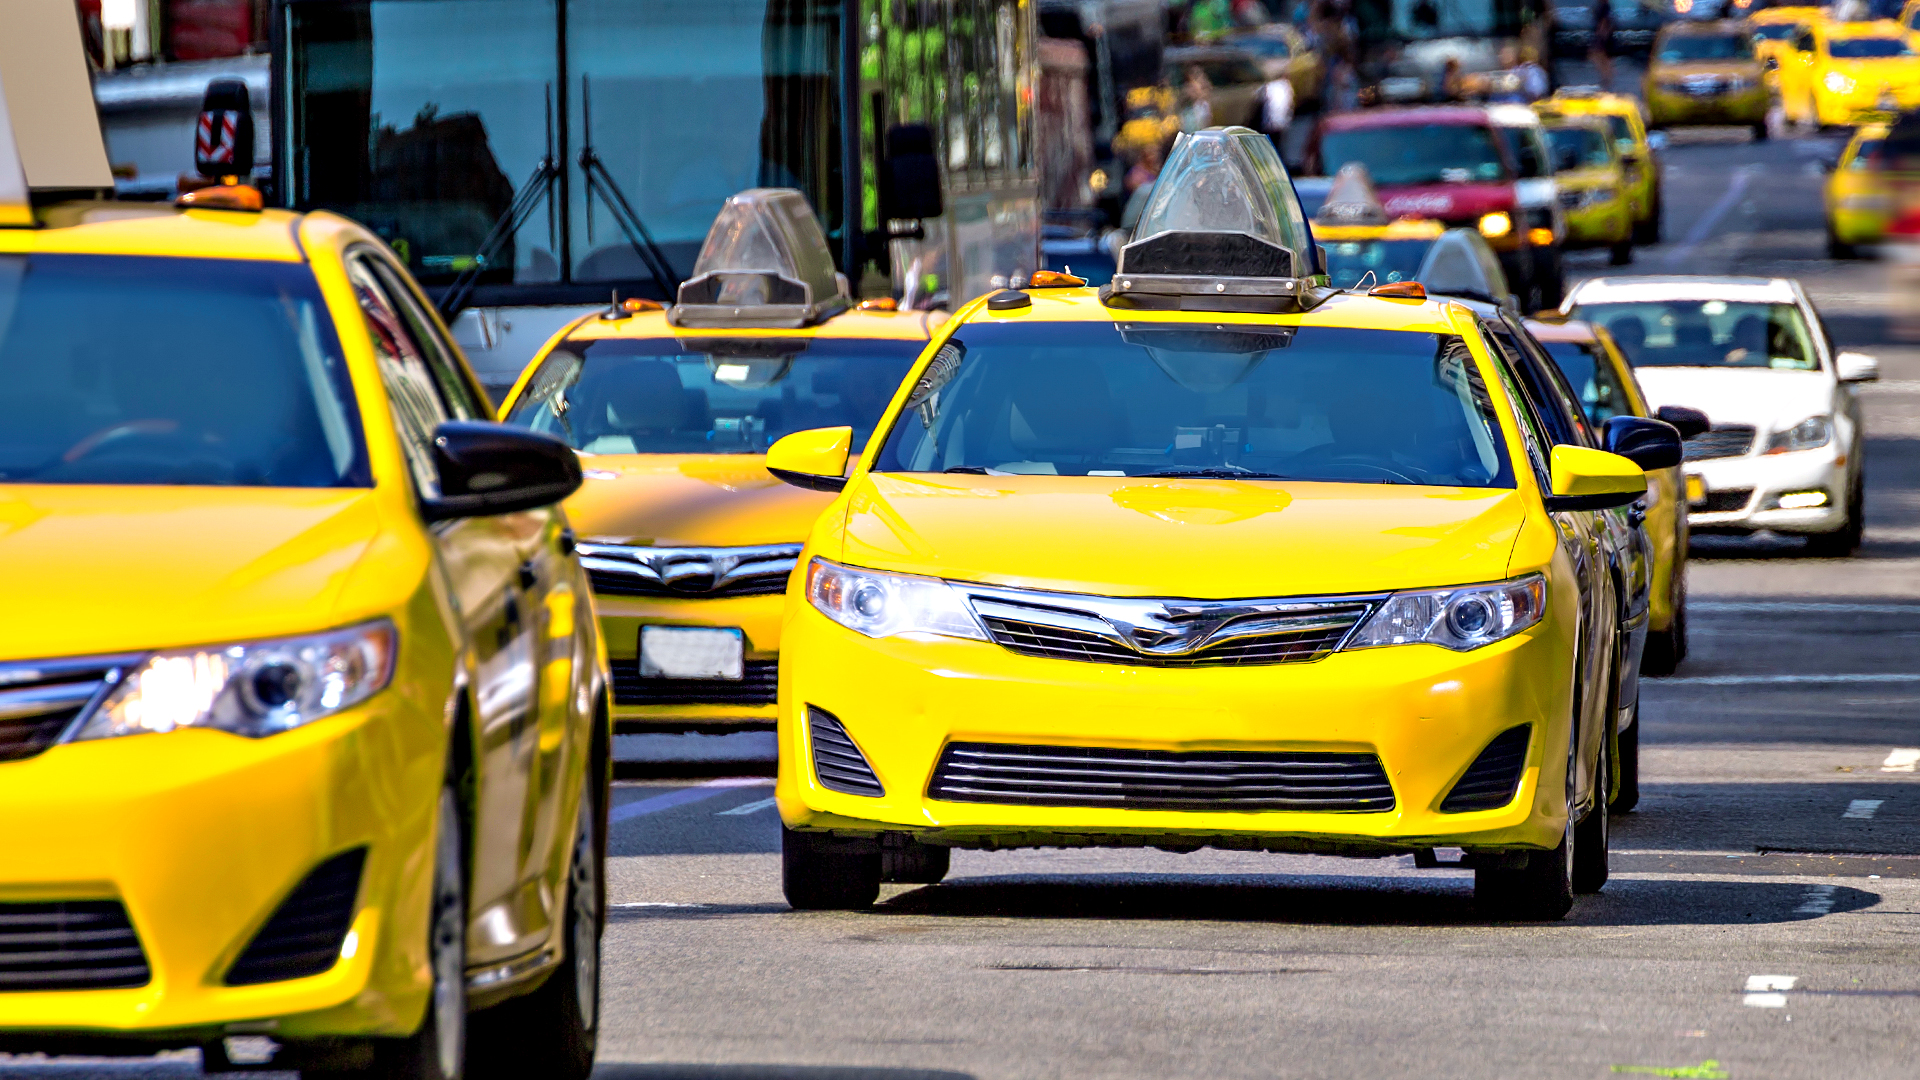 Come prenotare un taxi?